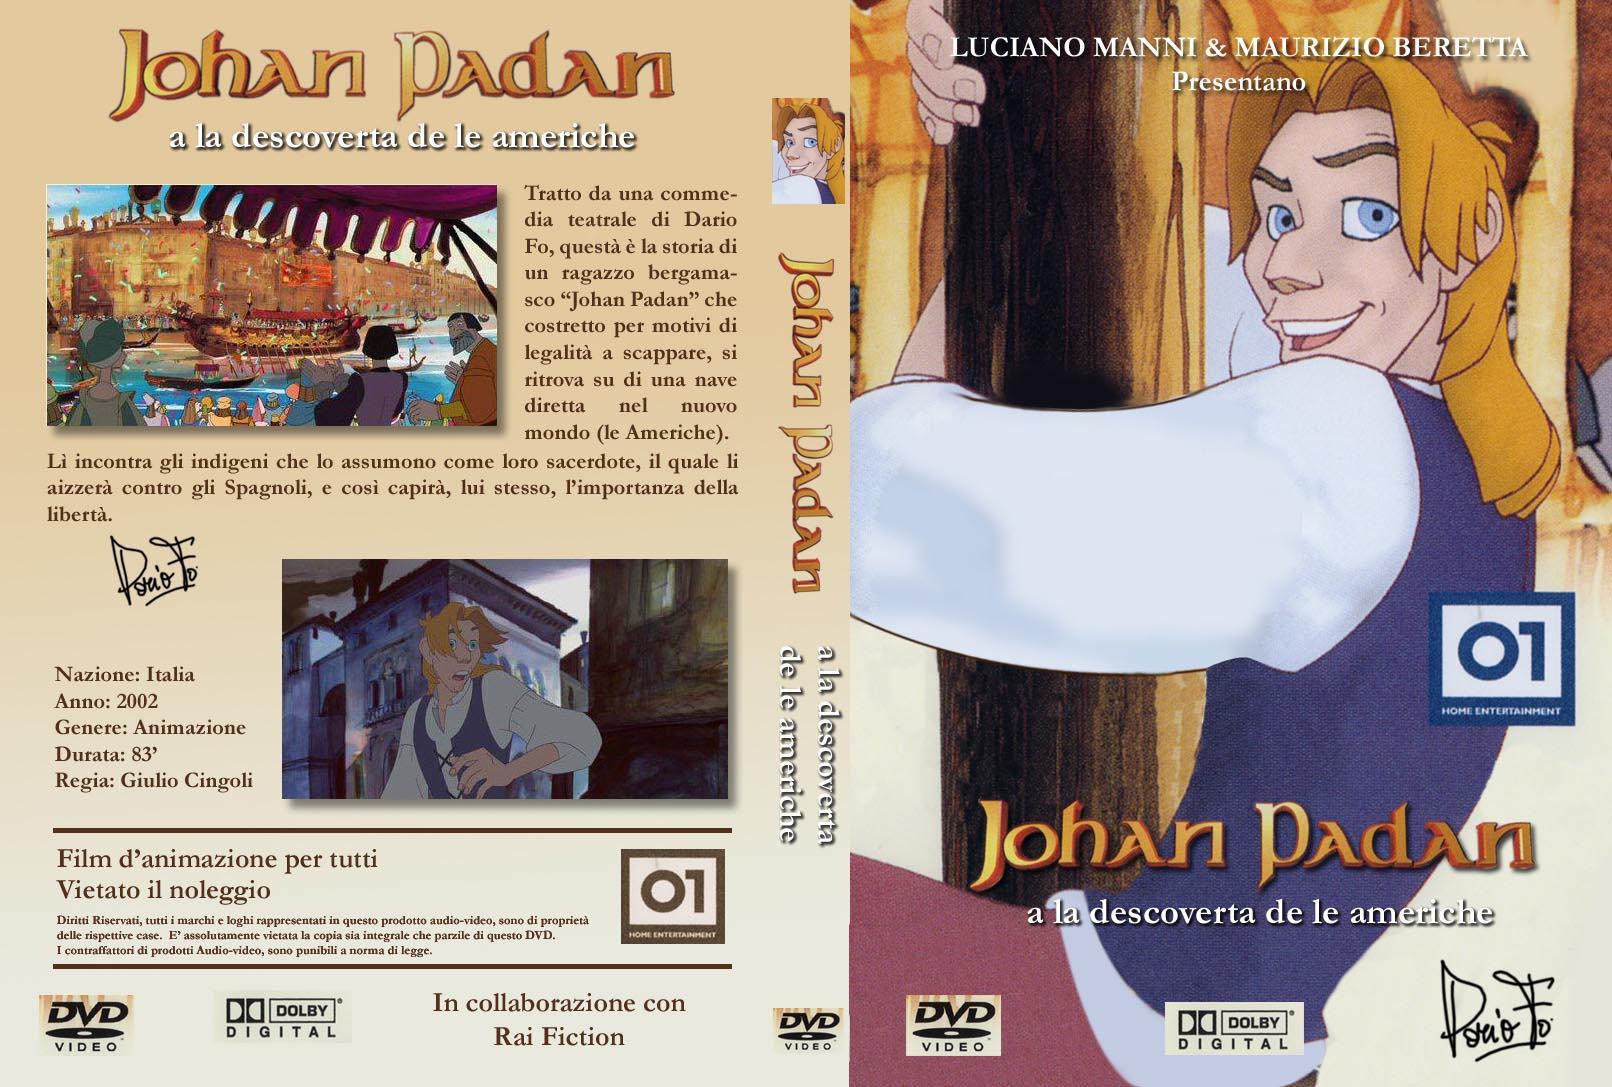 Johan_padan_a_la_descoverta_de_le_americhe_-_custom